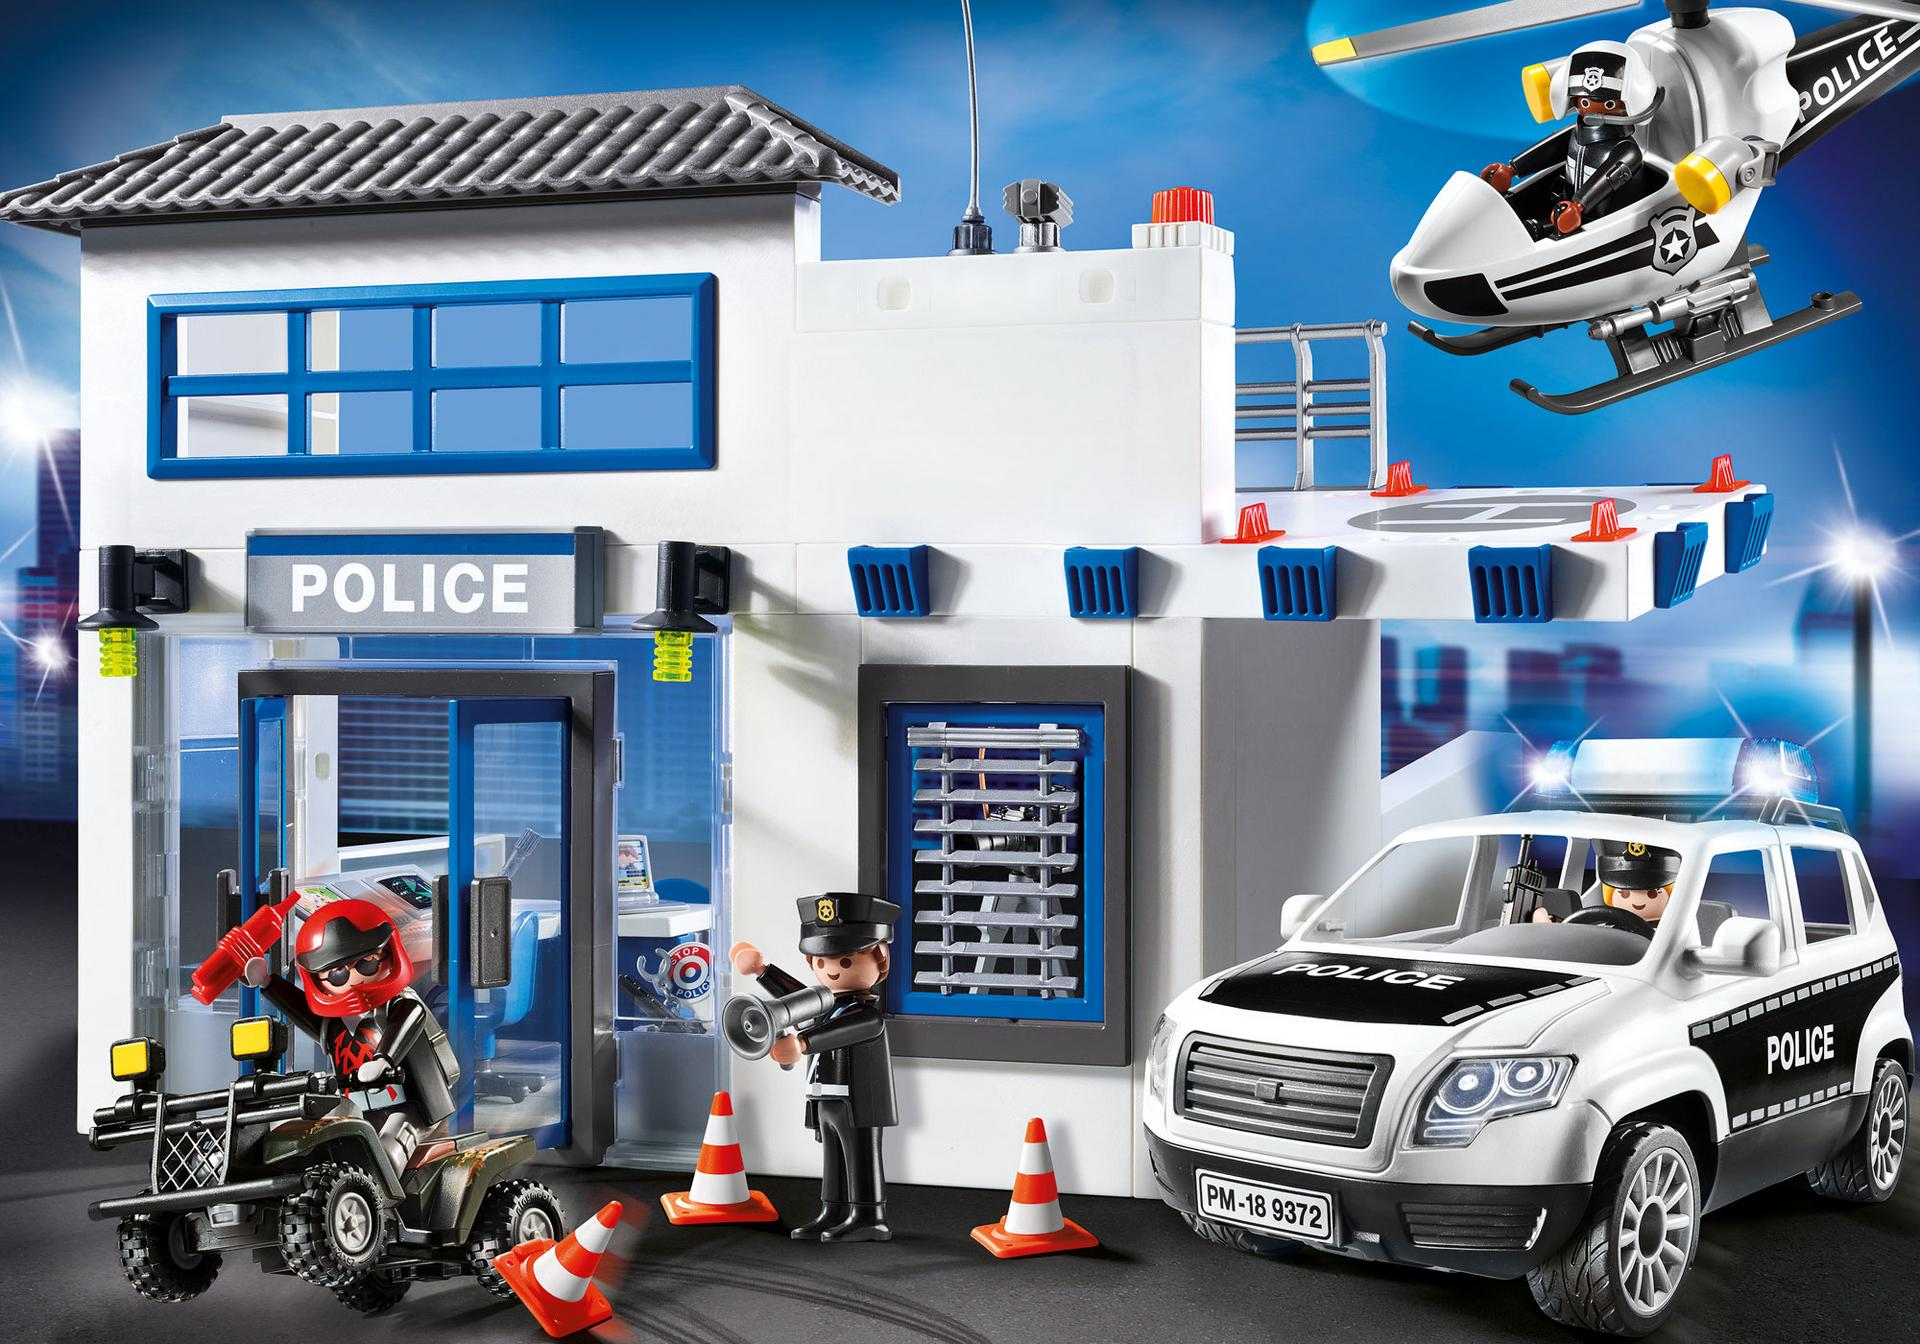 Polizeistation 9372 playmobil deutschland - Caserne de police playmobil ...